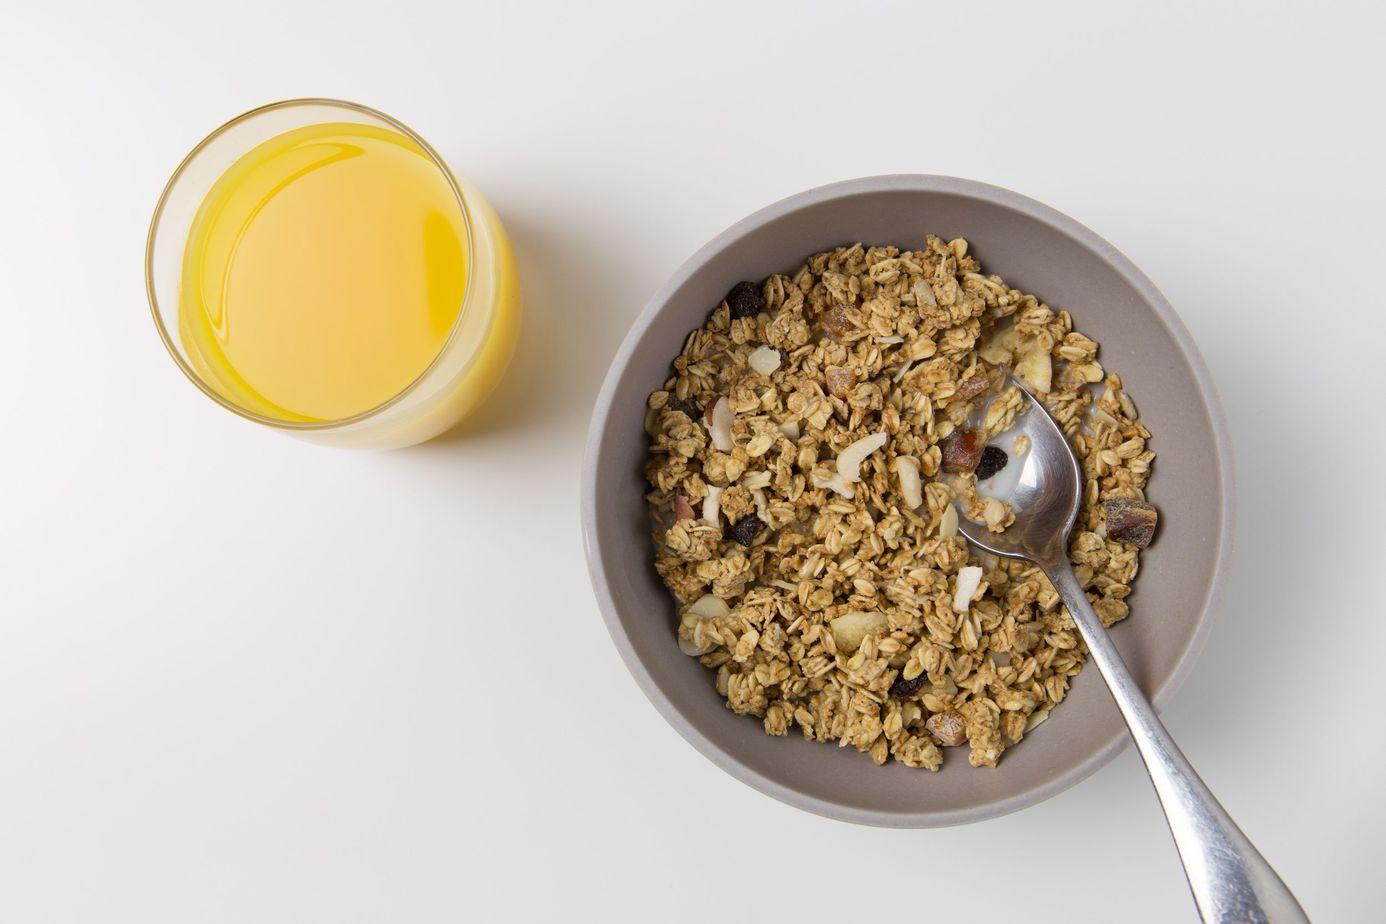 Boost immunity through Dietary Fibers to battle COVID-19